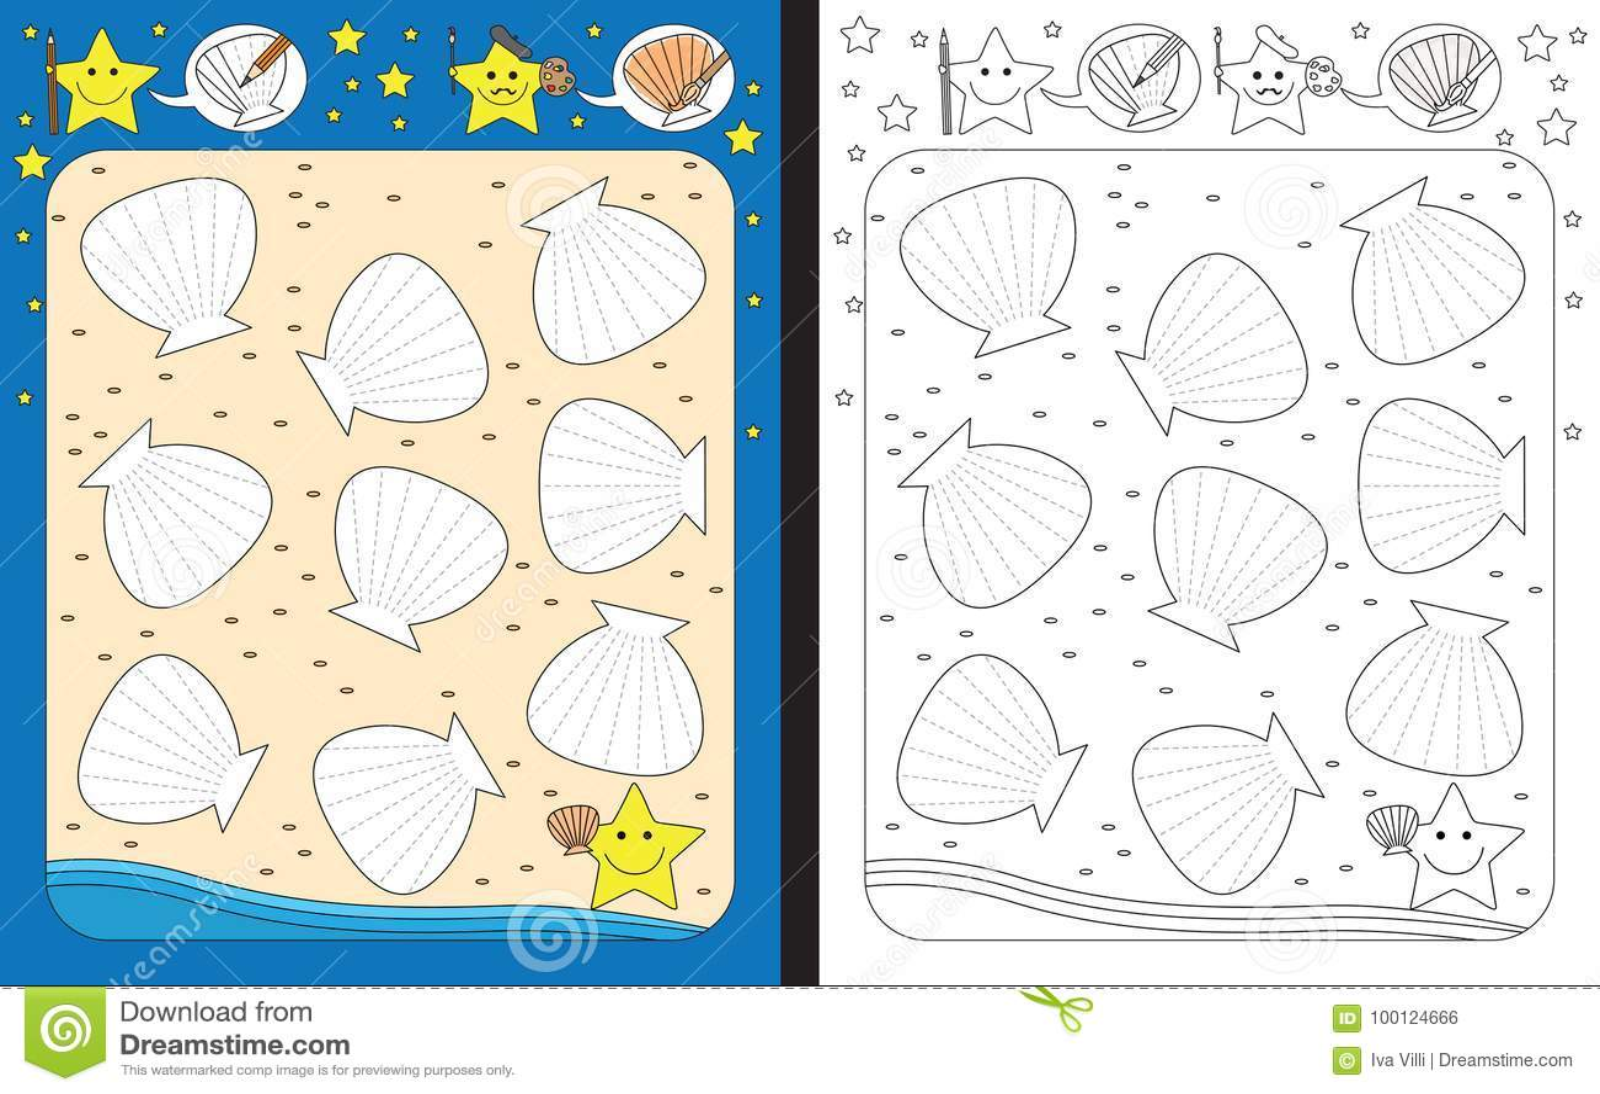 Preschool Worksheet Stock Vector Illustration Of Contour